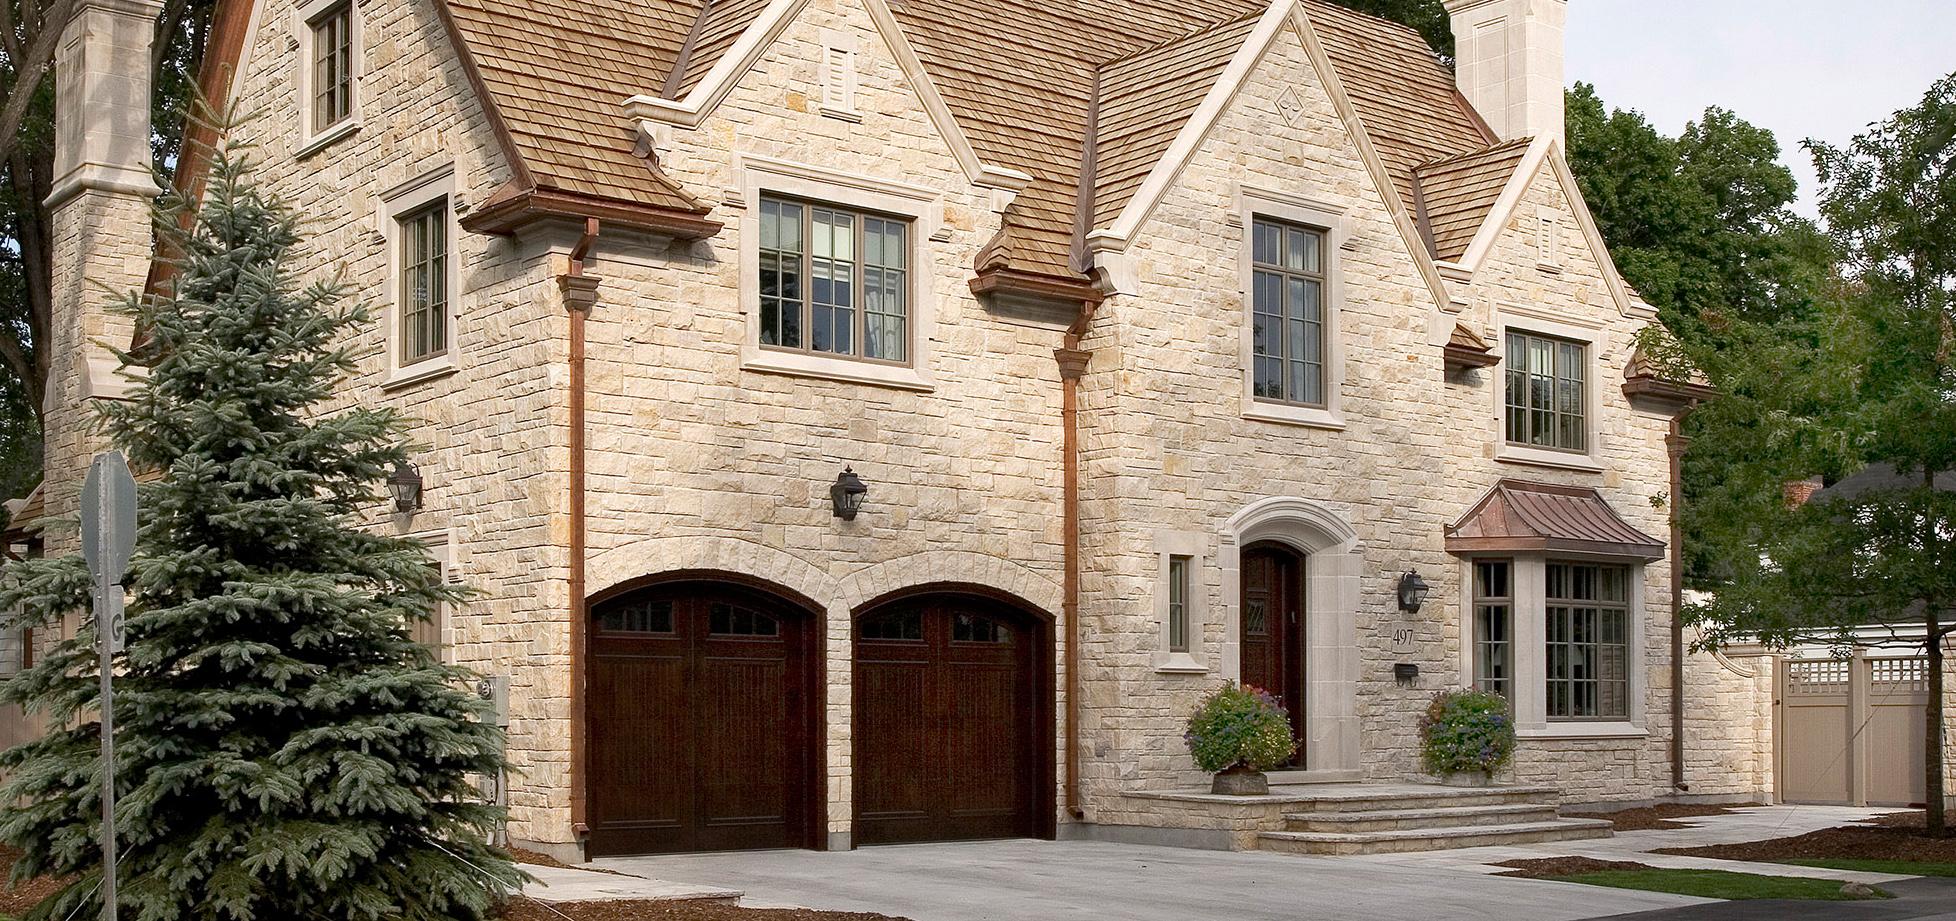 Susan firestone design associates ottawa interior design for Exterior home solutions ottawa